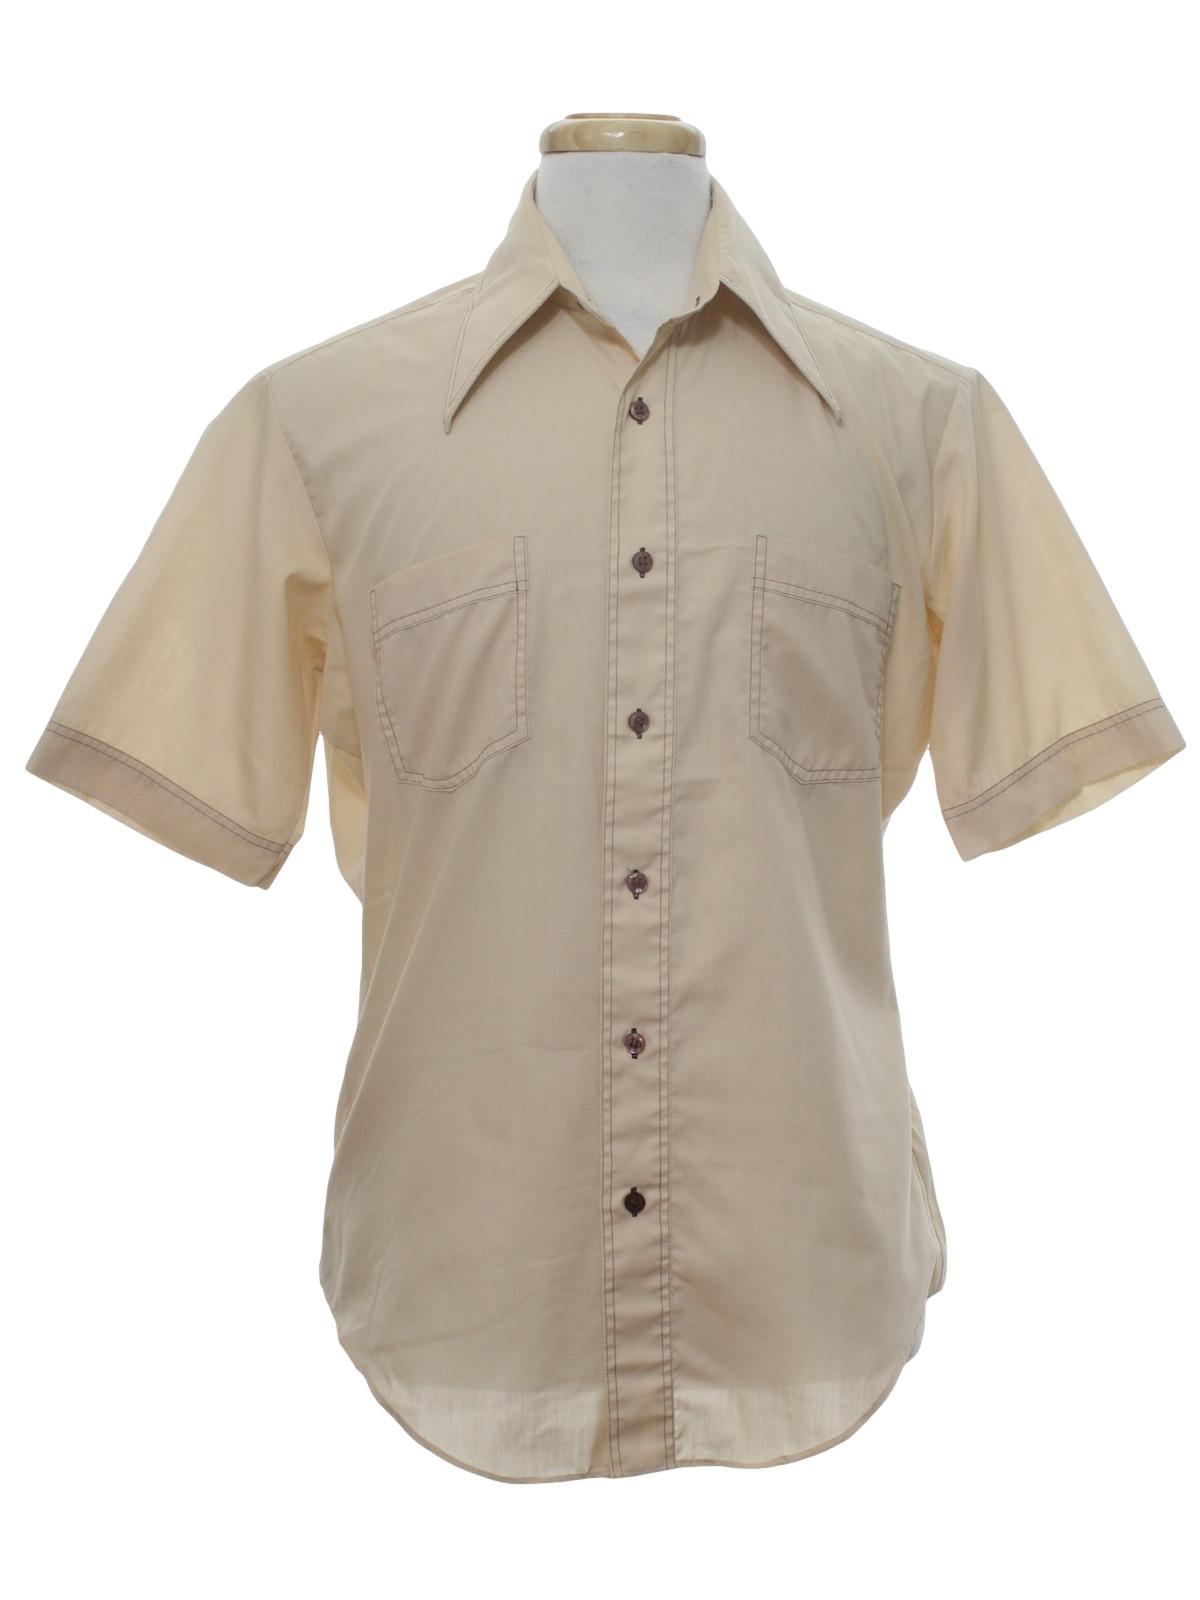 1970 39 s vintage kmart shirt 70s kmart mens tan for Kmart button up shirts